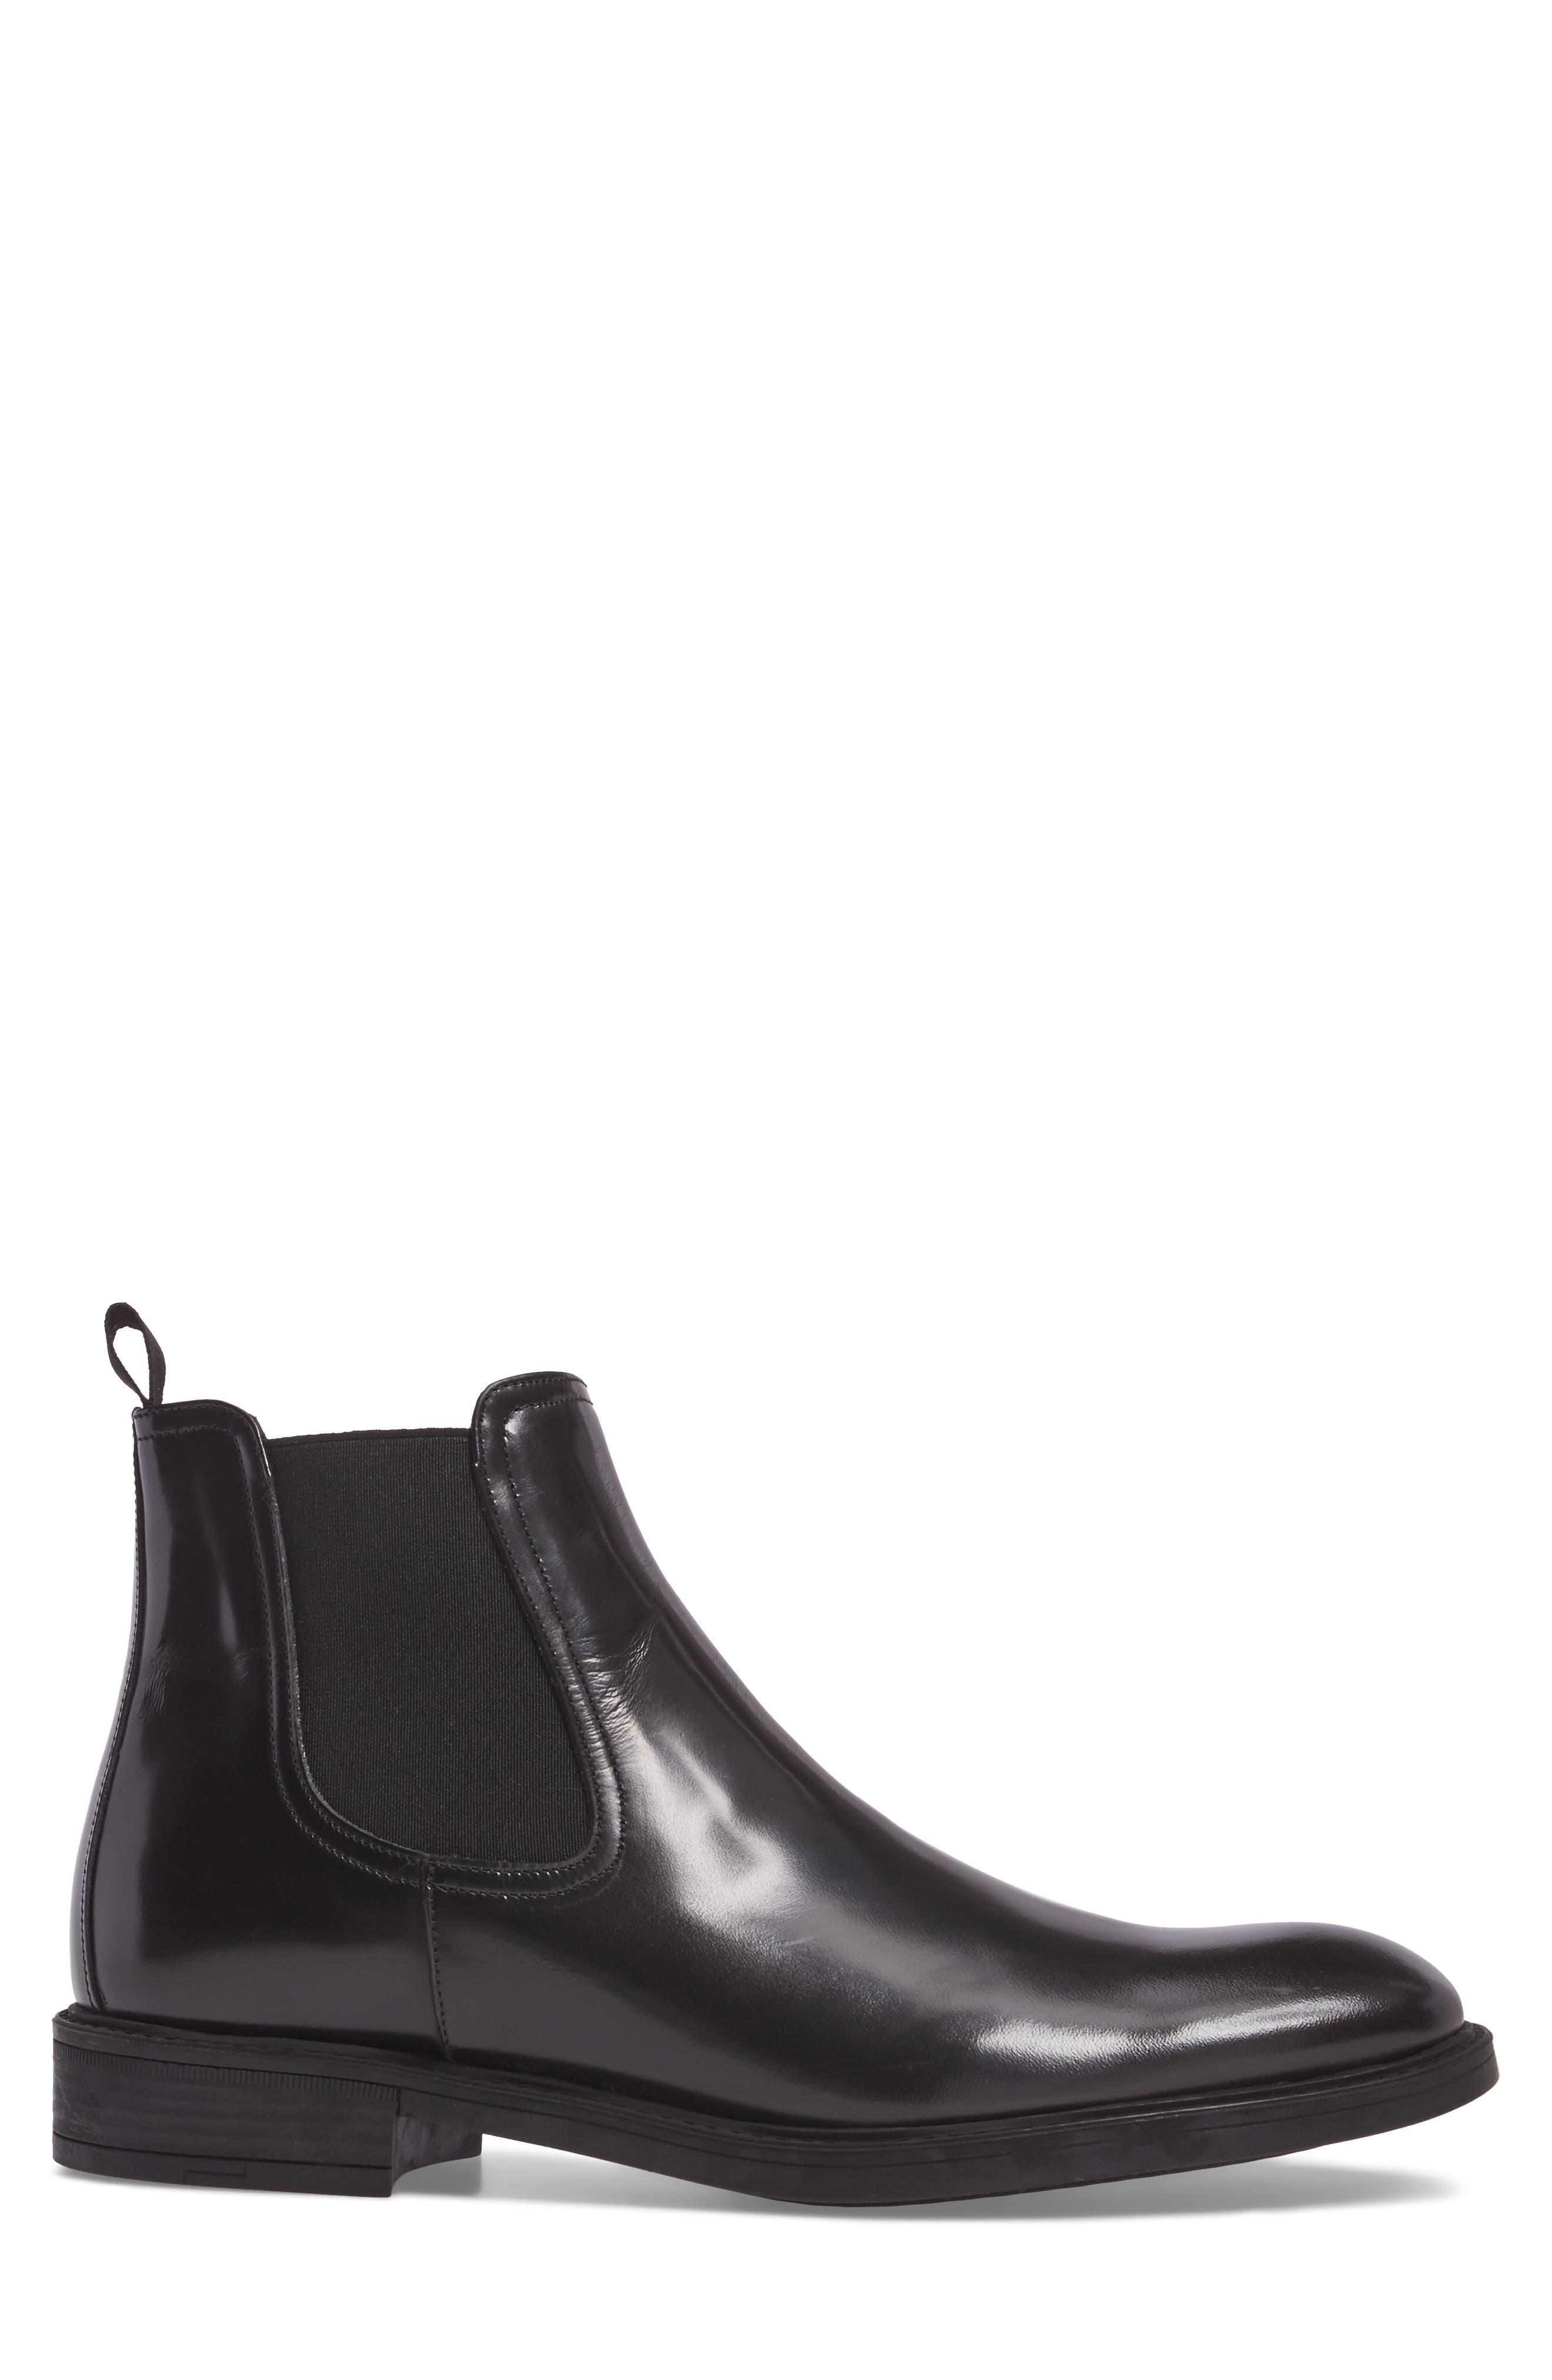 Chelsea Boot,                             Alternate thumbnail 3, color,                             001